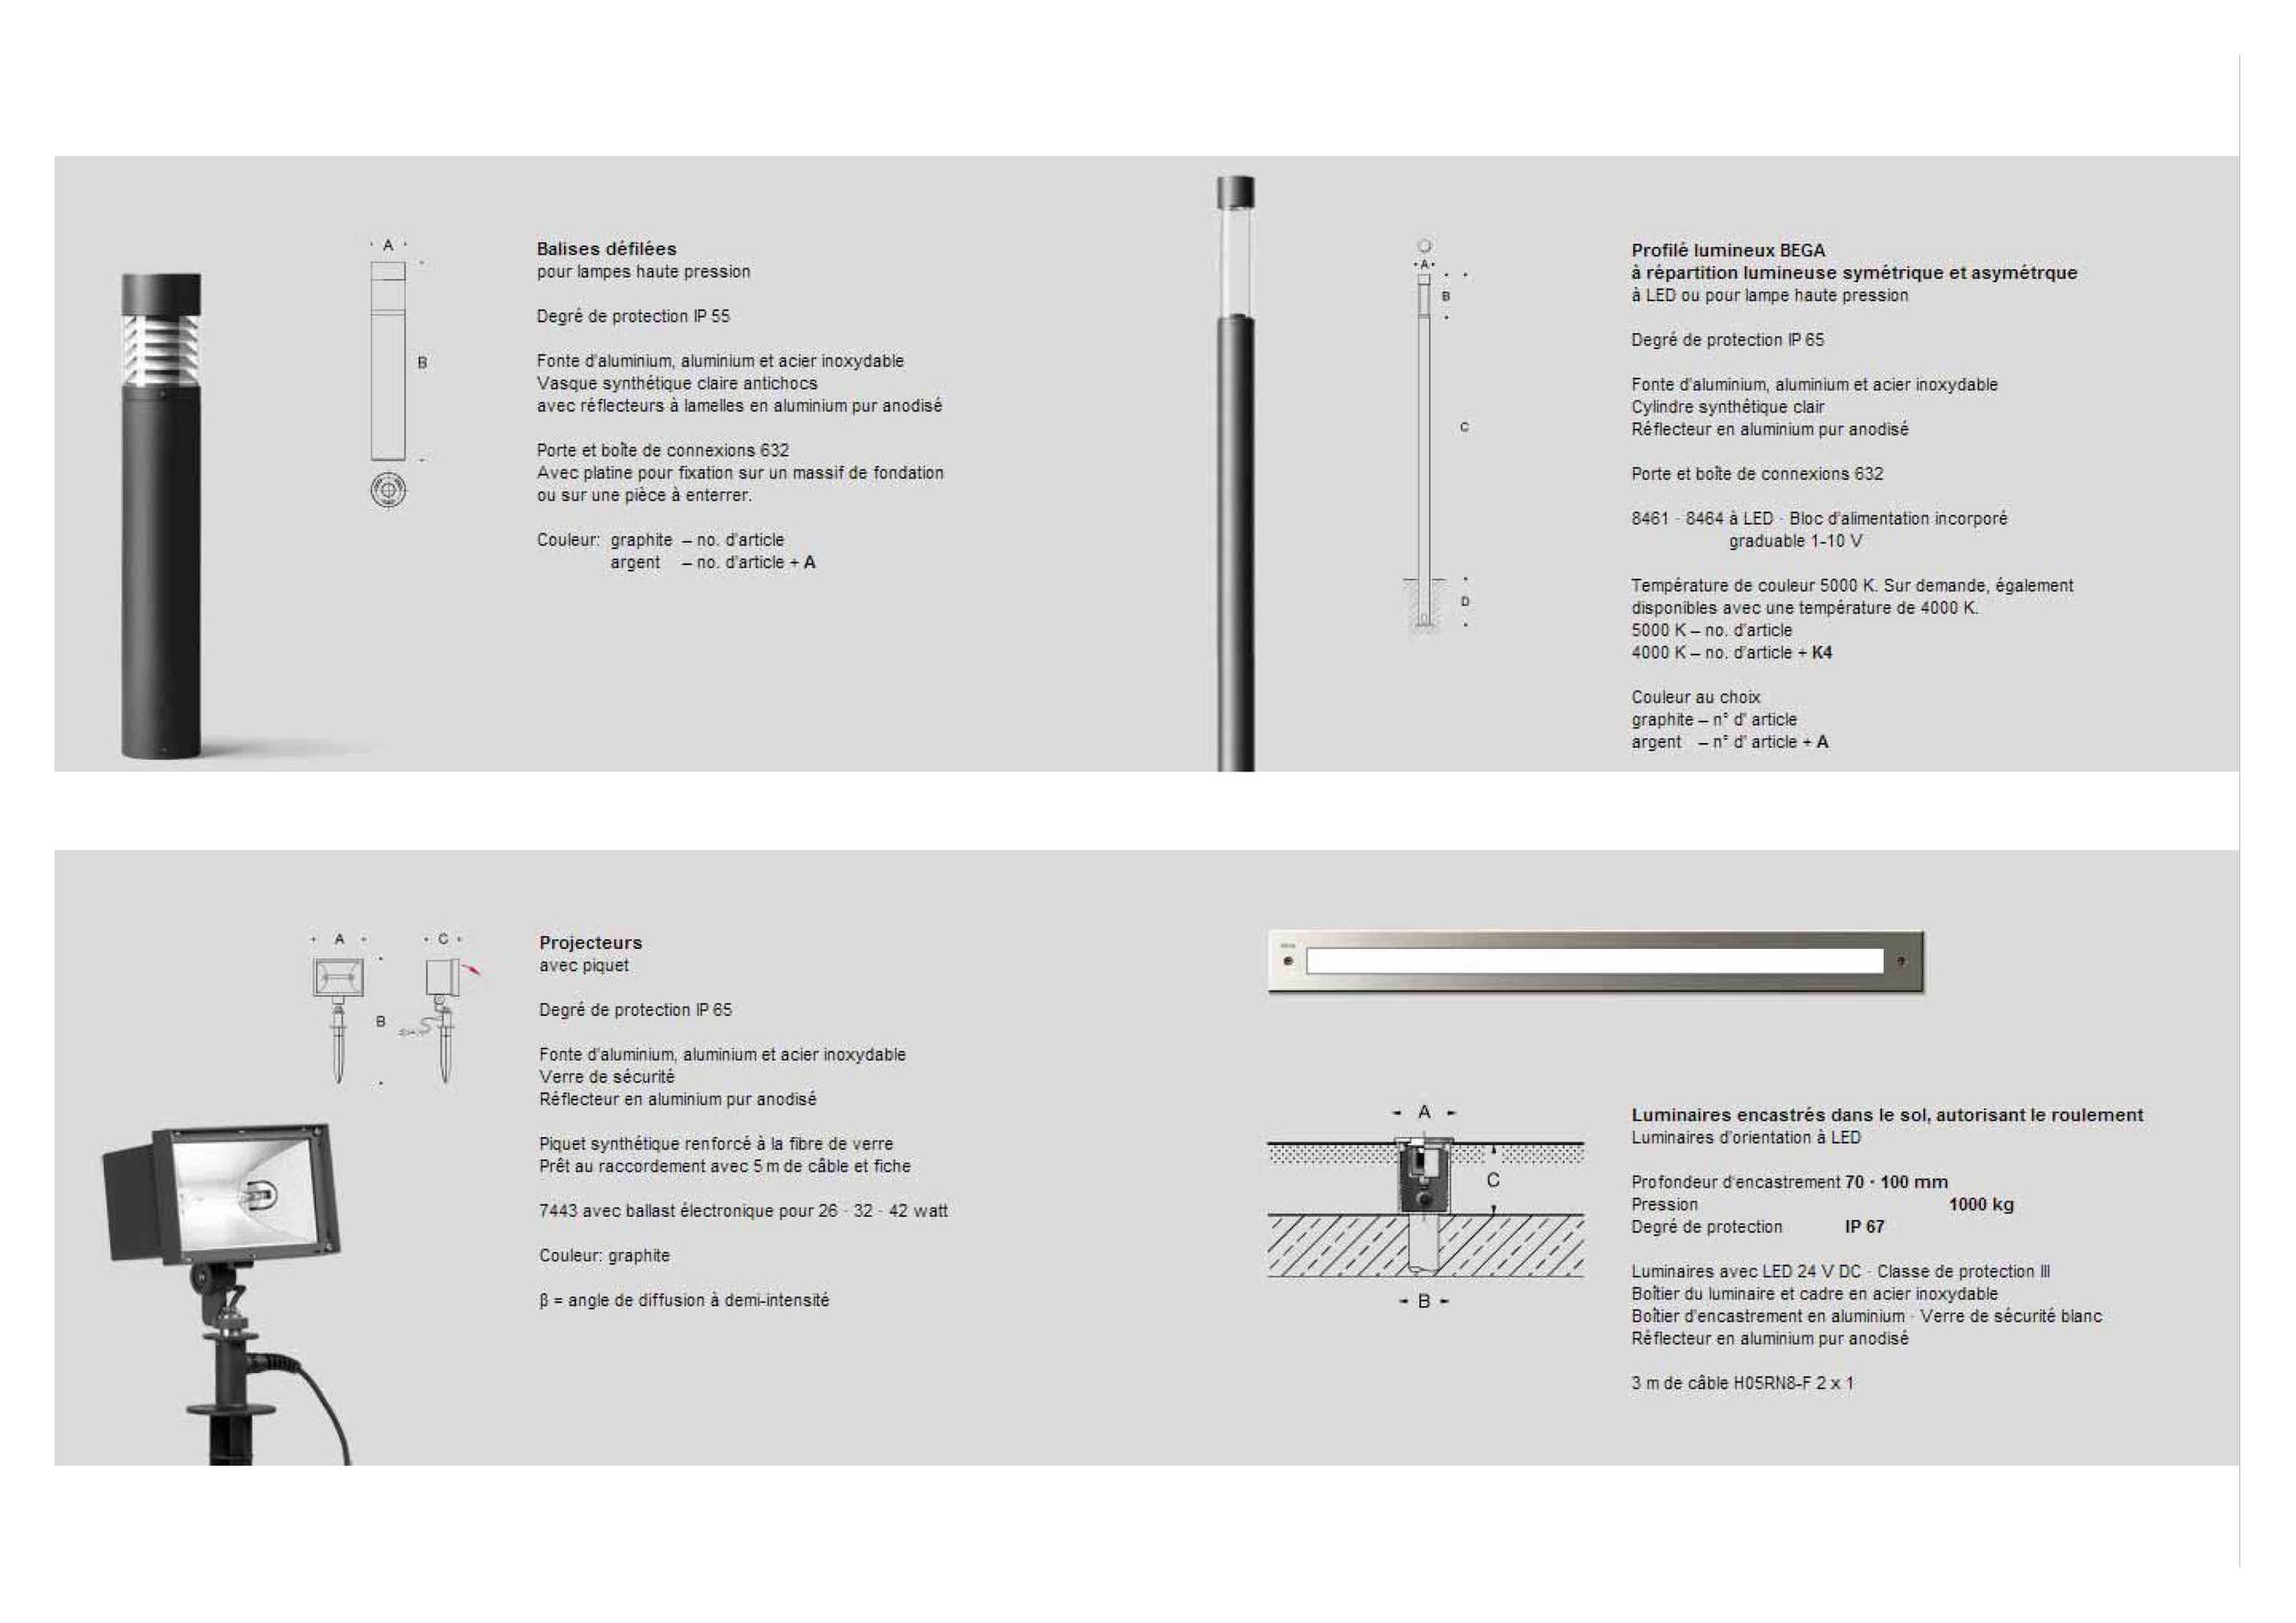 BORDEAUX - ATEAC - 2013.06 (24).jpg